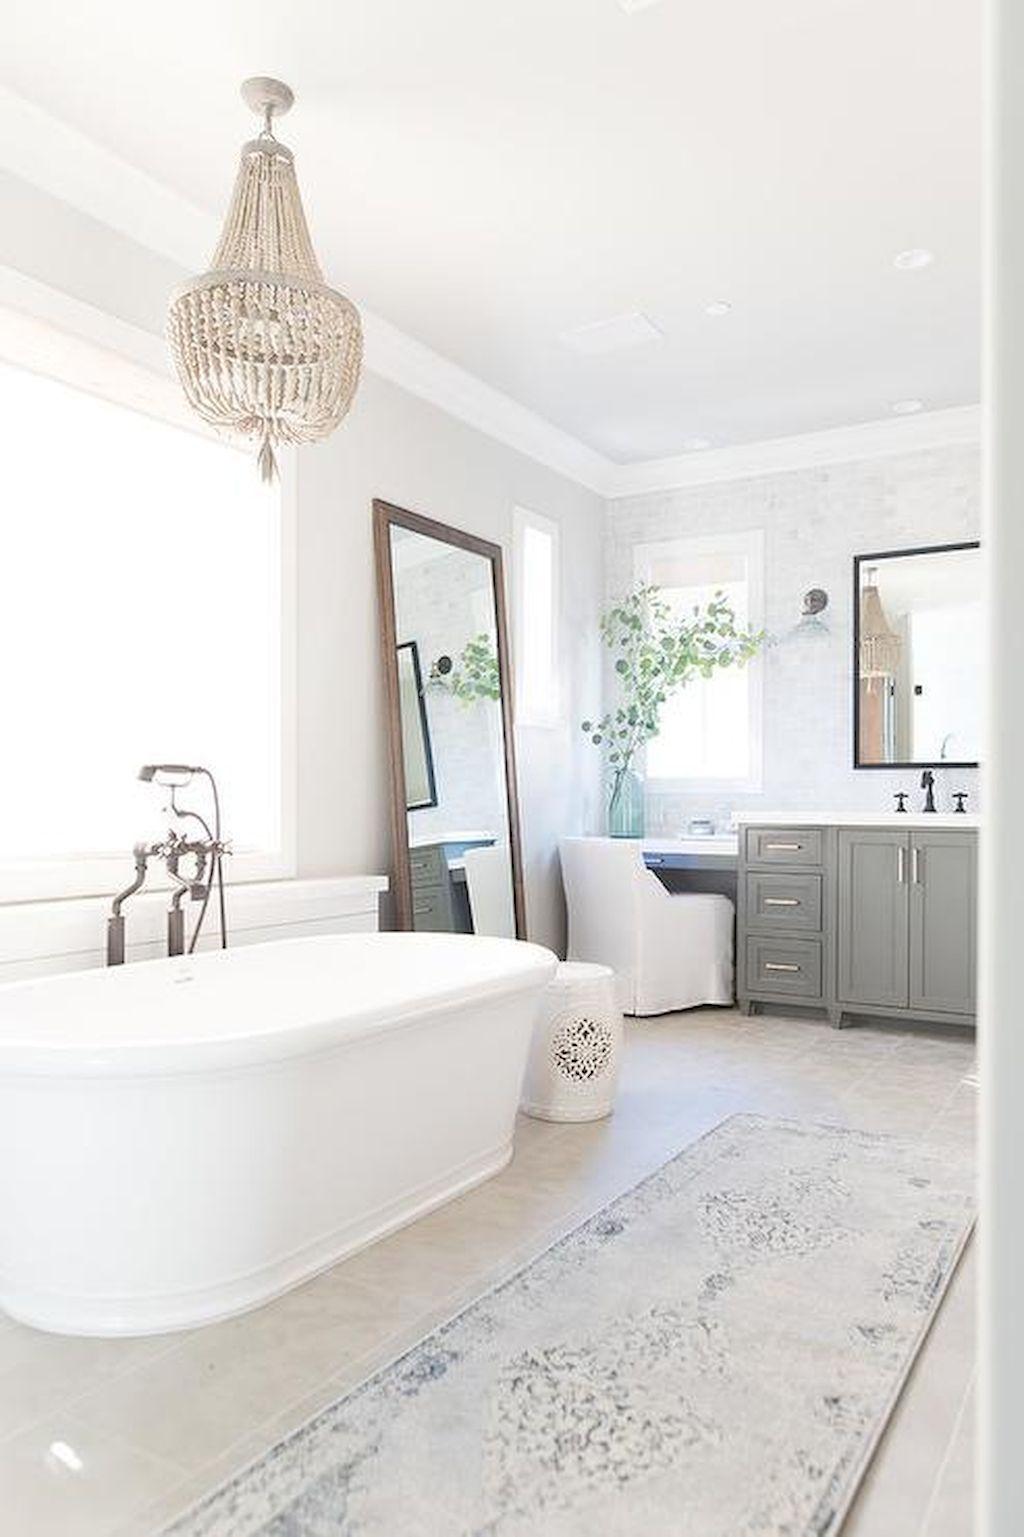 beautiful master bathroom remodel ideas 25 modern on bathroom renovation ideas modern id=88256